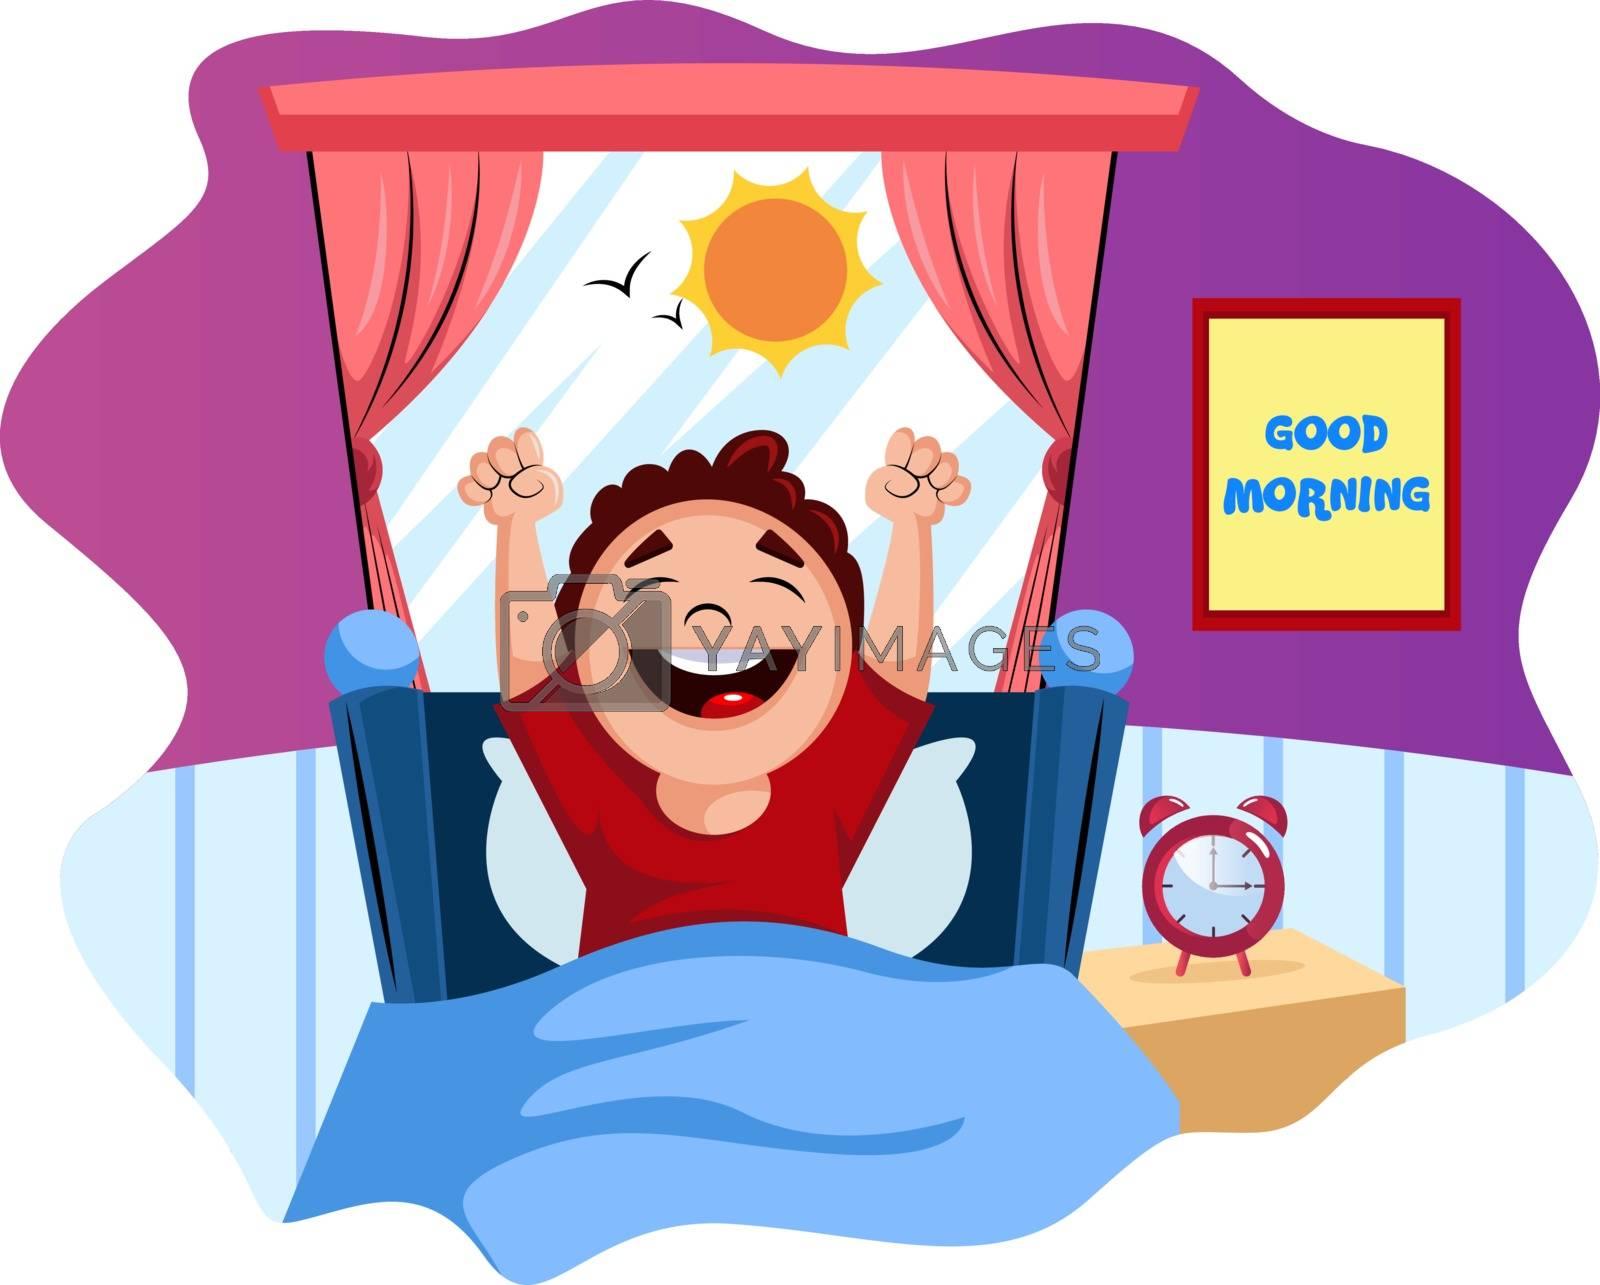 Royalty free image of Boy woke up happy illustration vector on white background by Morphart